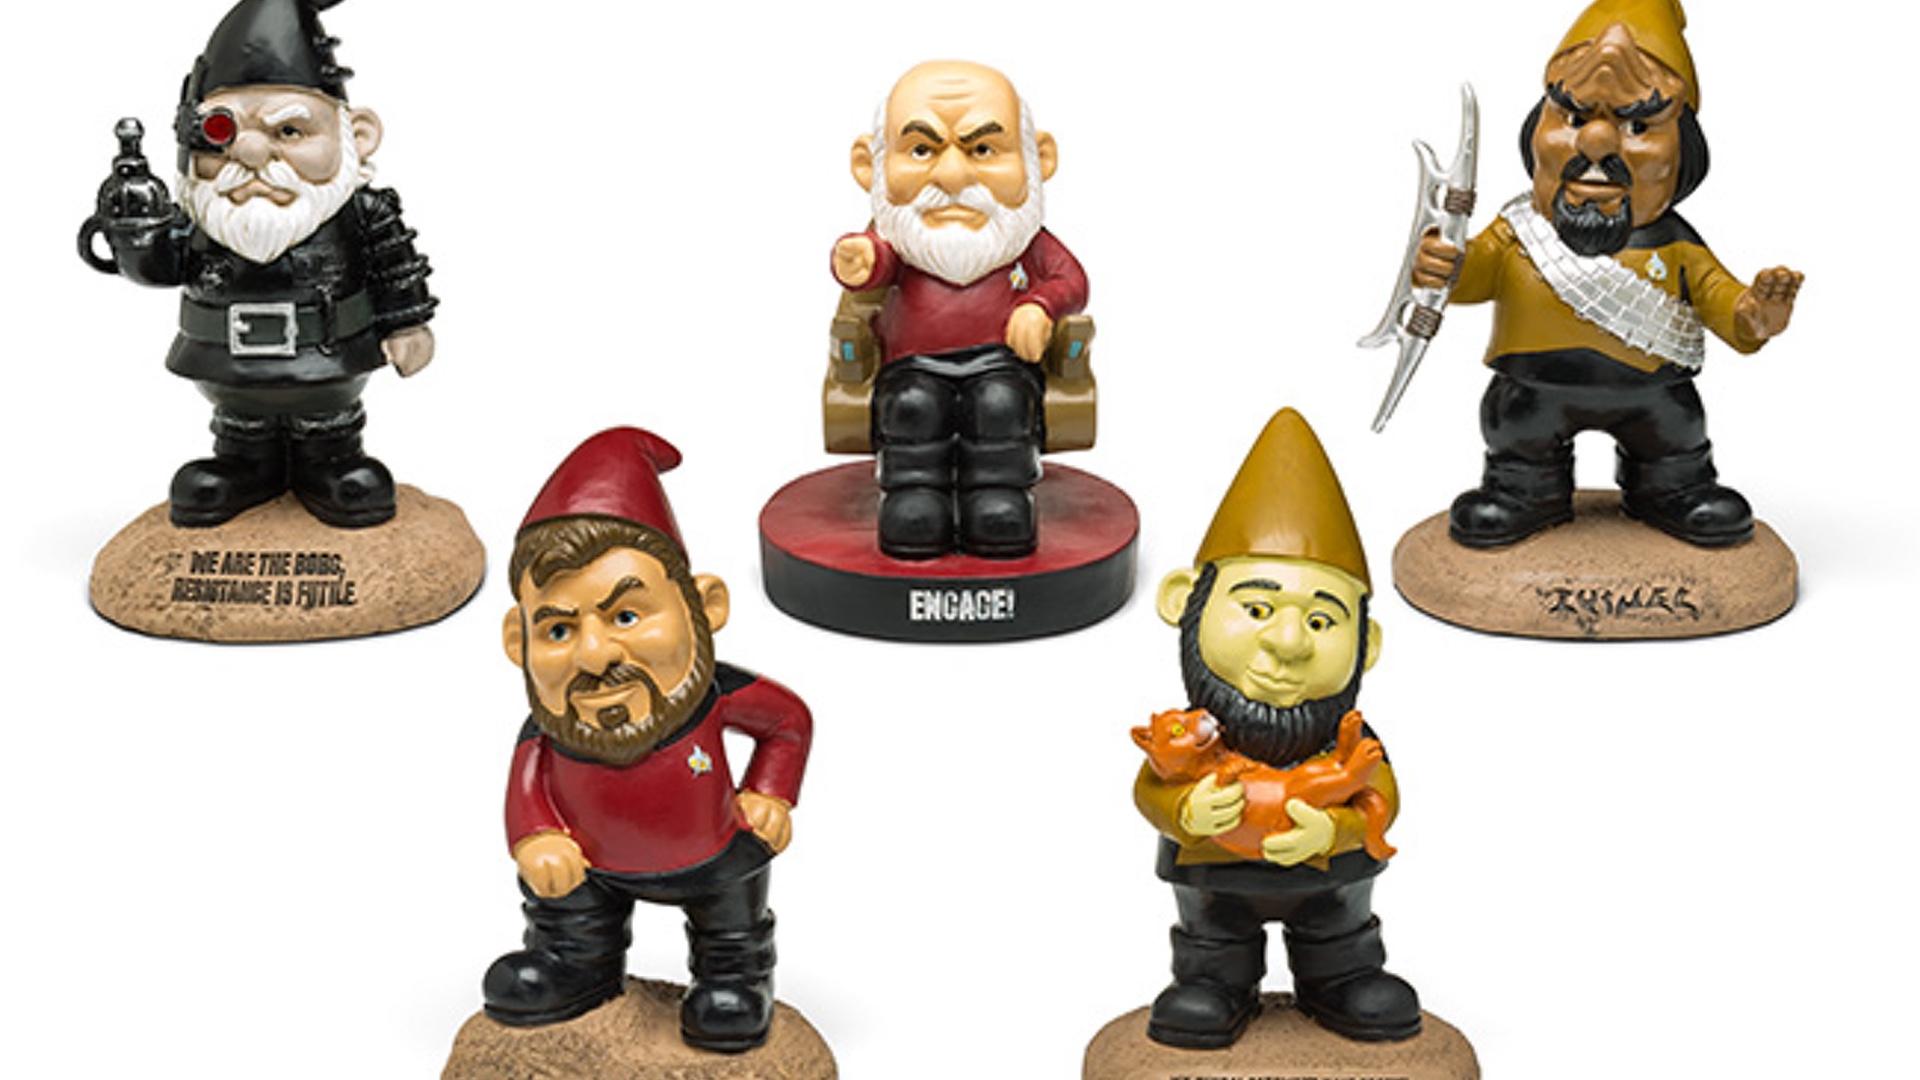 Gnome In Garden: STAR TREK: THE NEXT GENERATION Family Car Decals